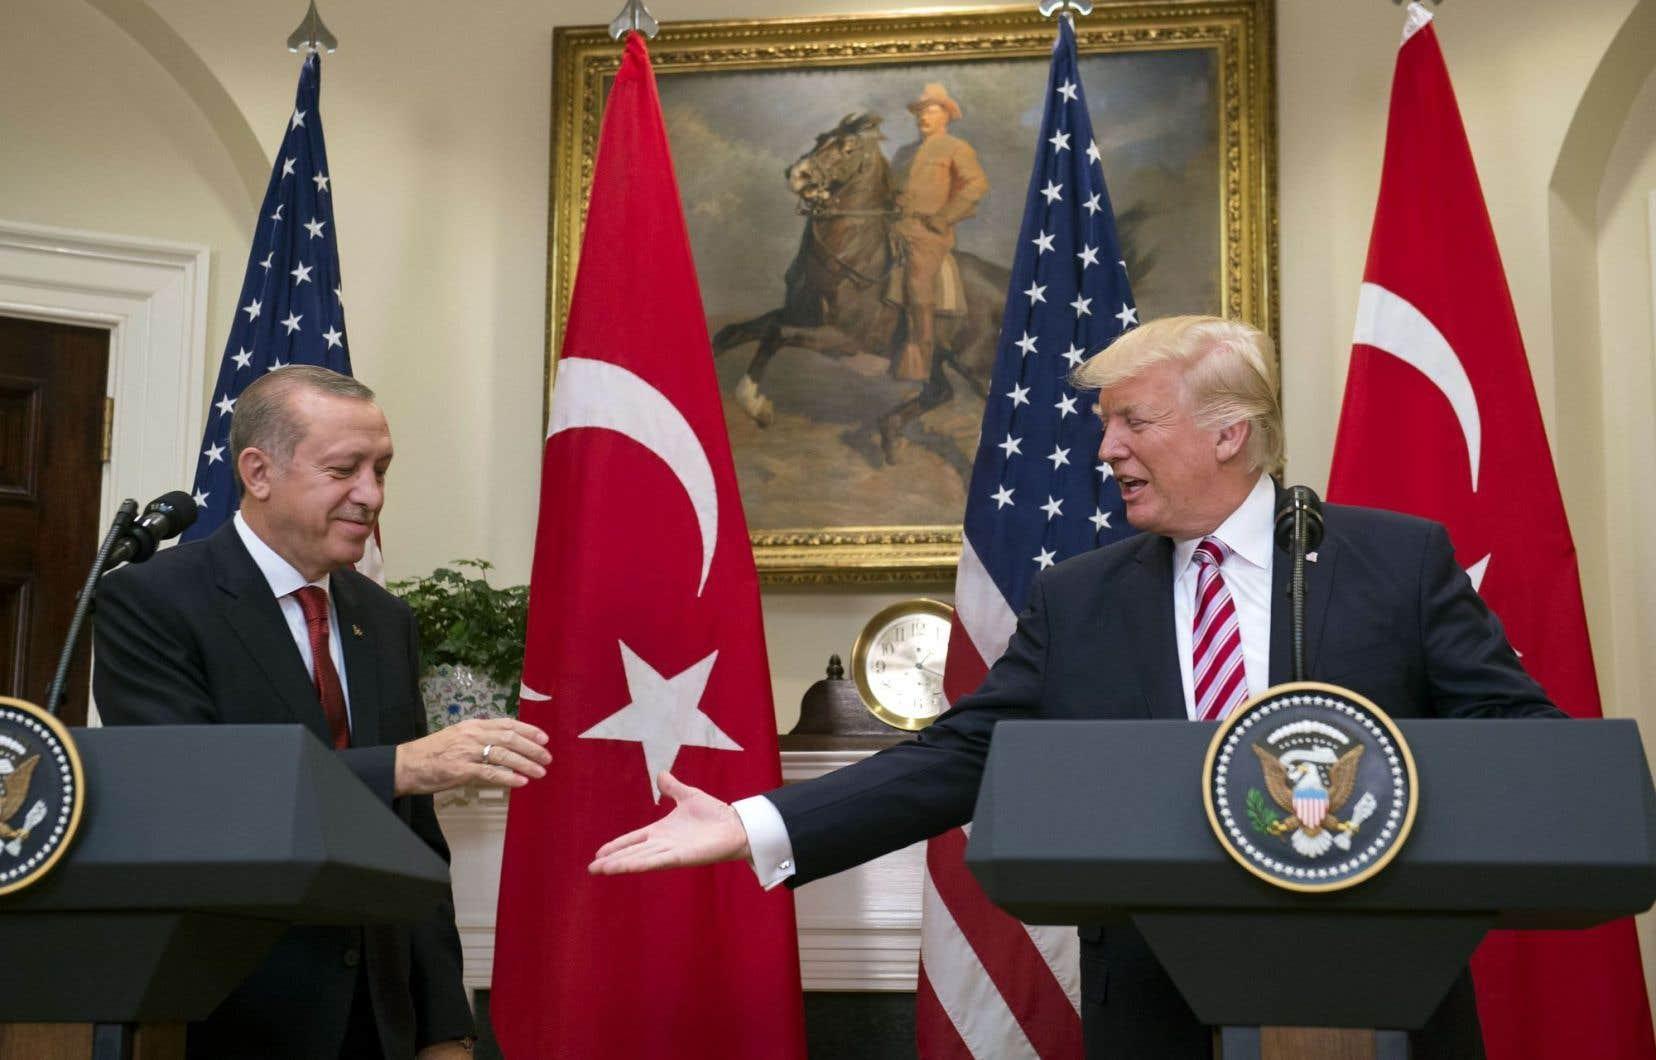 Recep Tayyip Erdogan a été reçu par Donald Trump mardi à Washington.